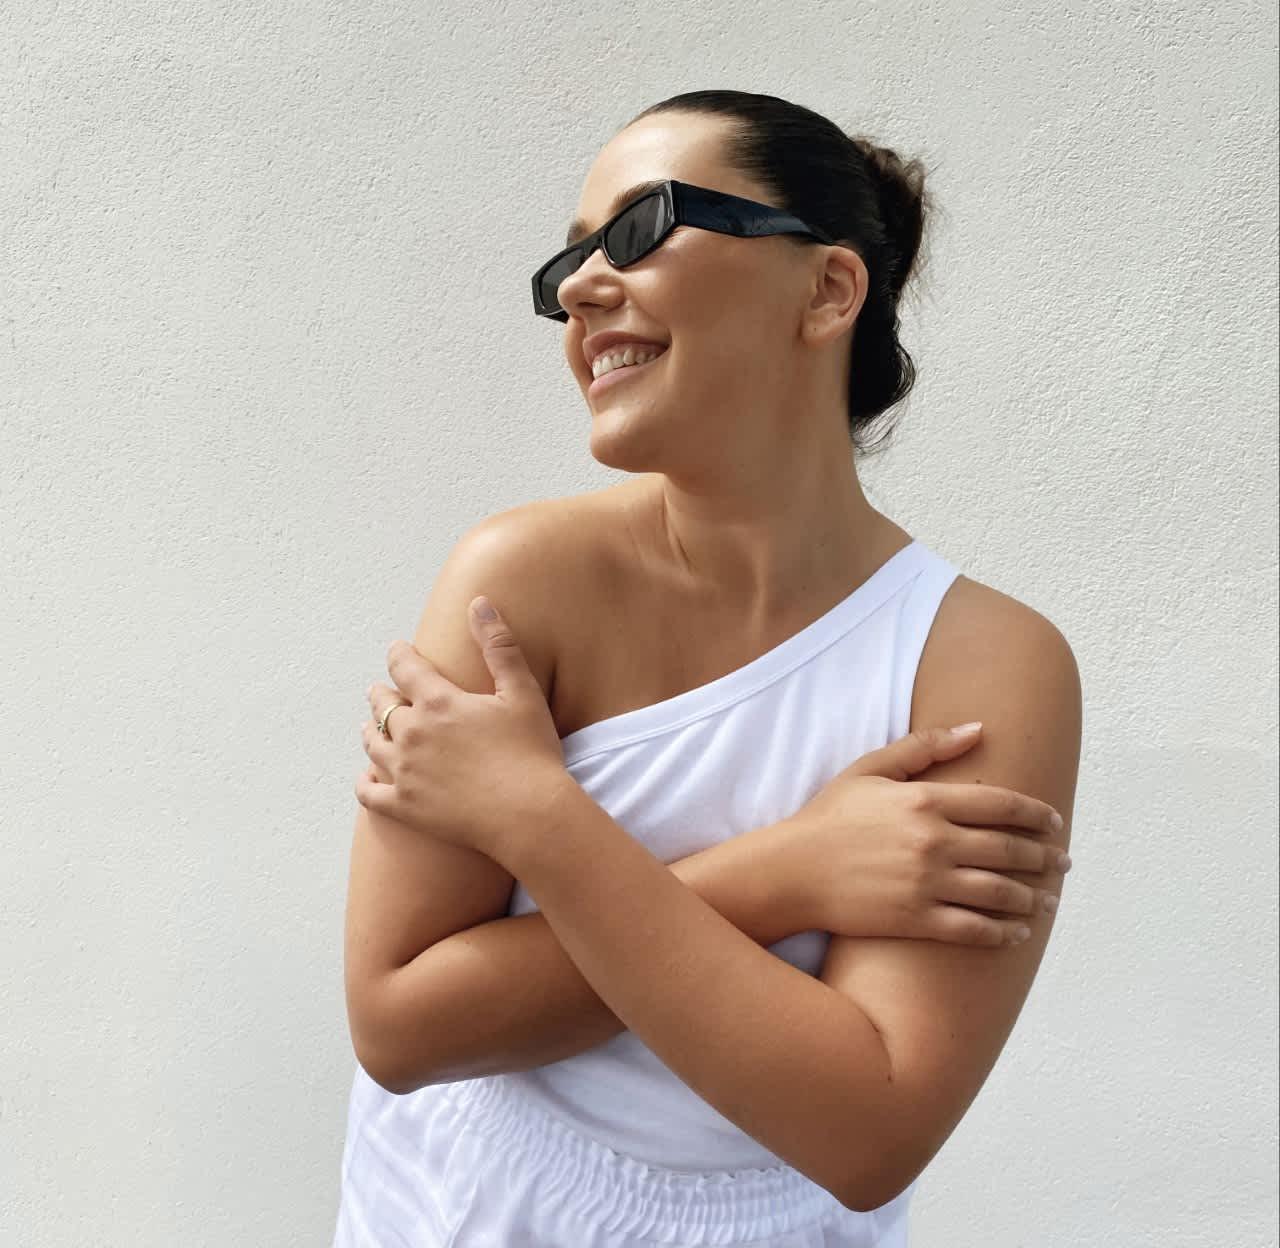 Image of Laura Roscioli